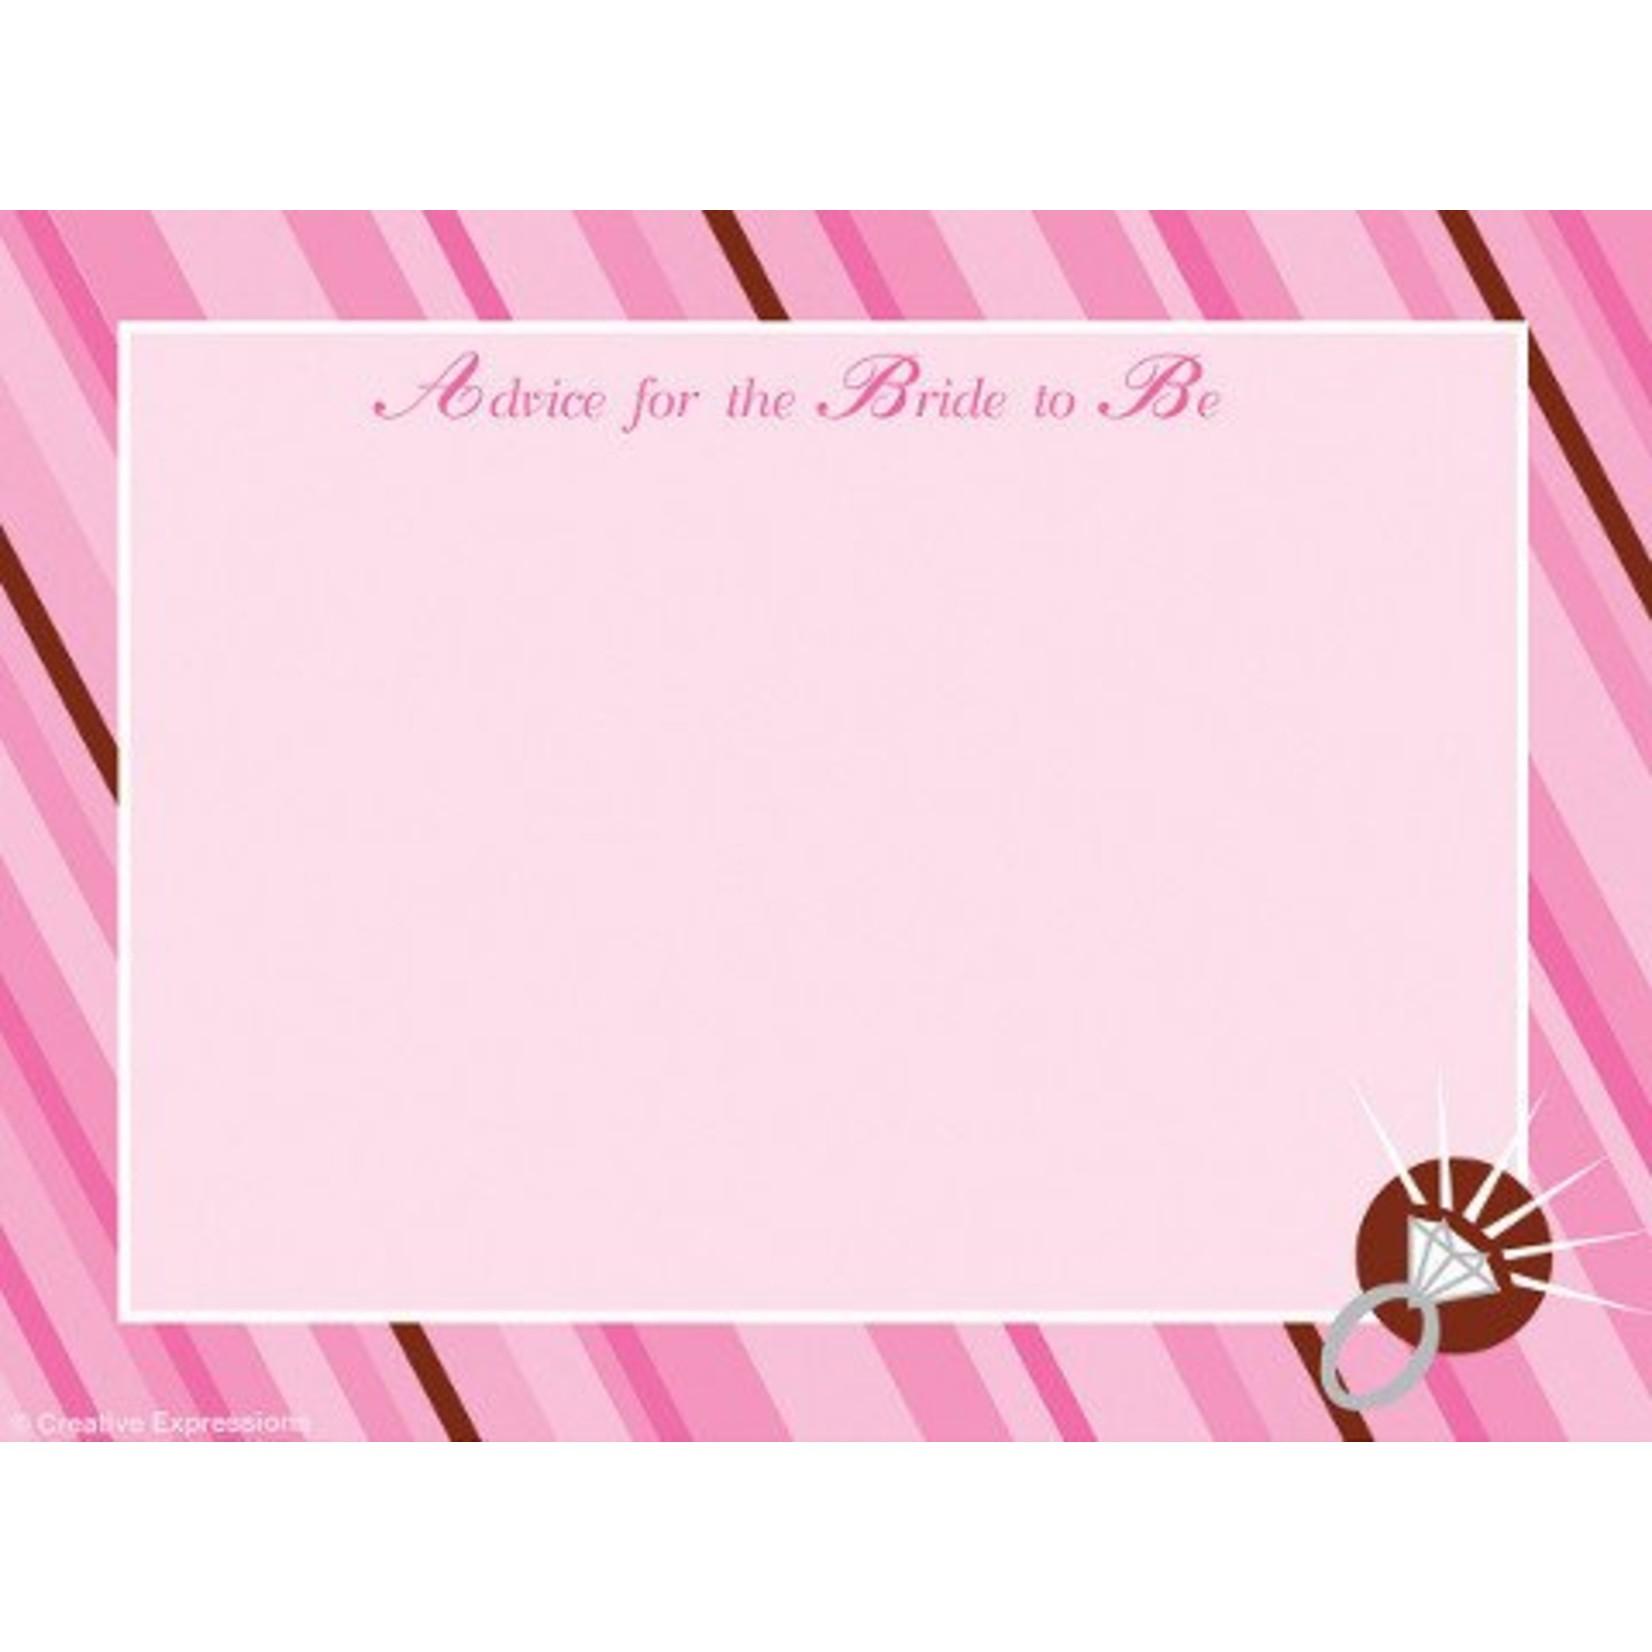 Advice Cards-Bride To Be-20pkg